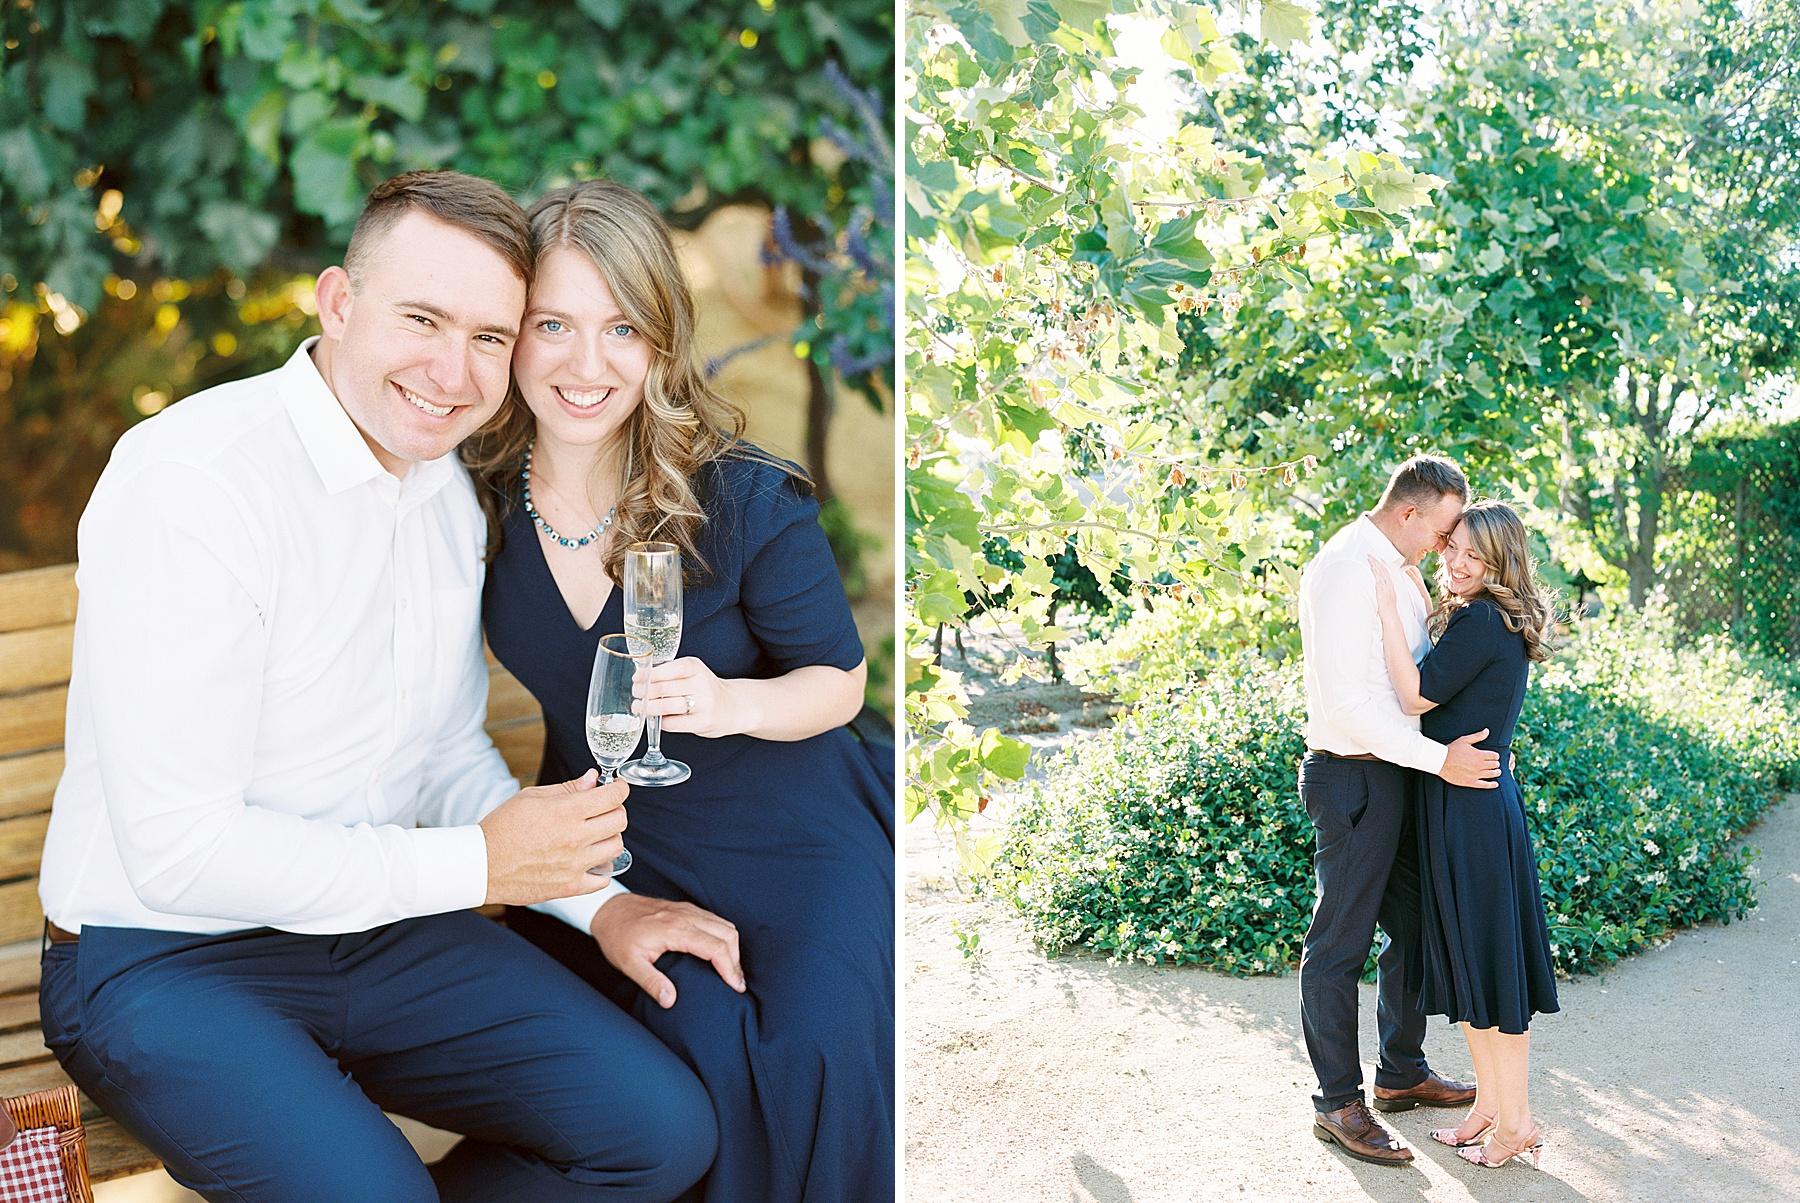 Scribner Bend Winery Engagement Session - Courtney and Steven - Ashley Baumgartner - Sribner Bend Wedding Photographer - Sacramento Wedding Photographer_0010.jpg